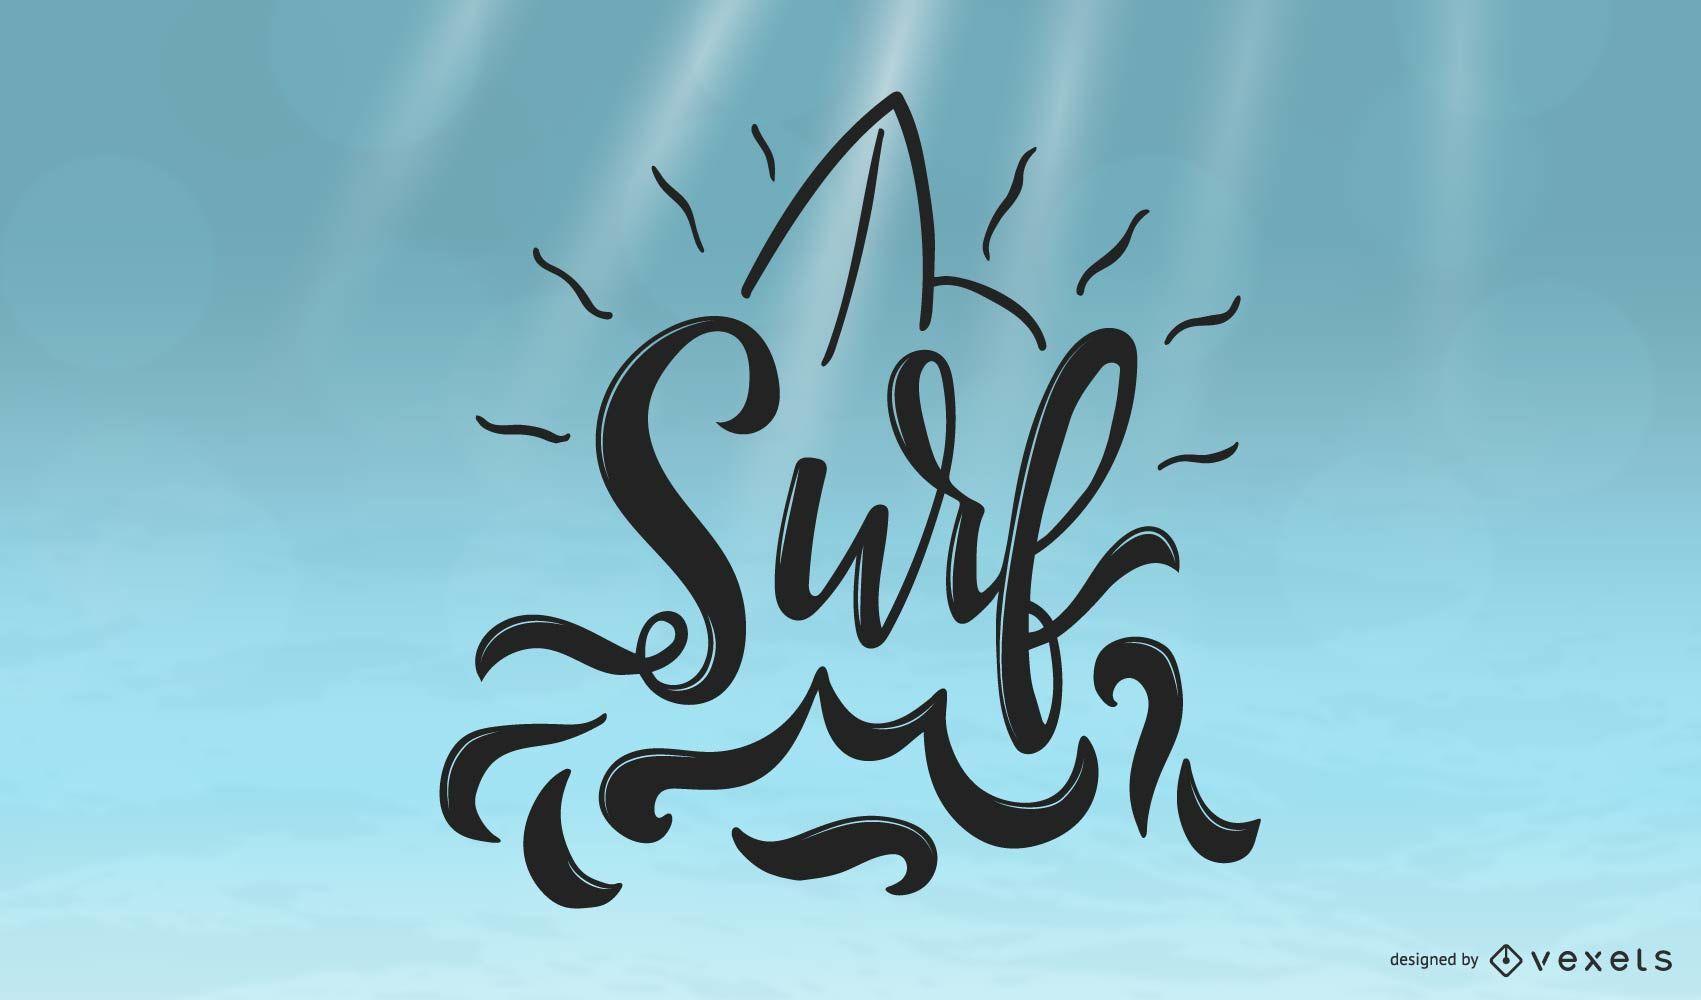 Cool Surf Lettering